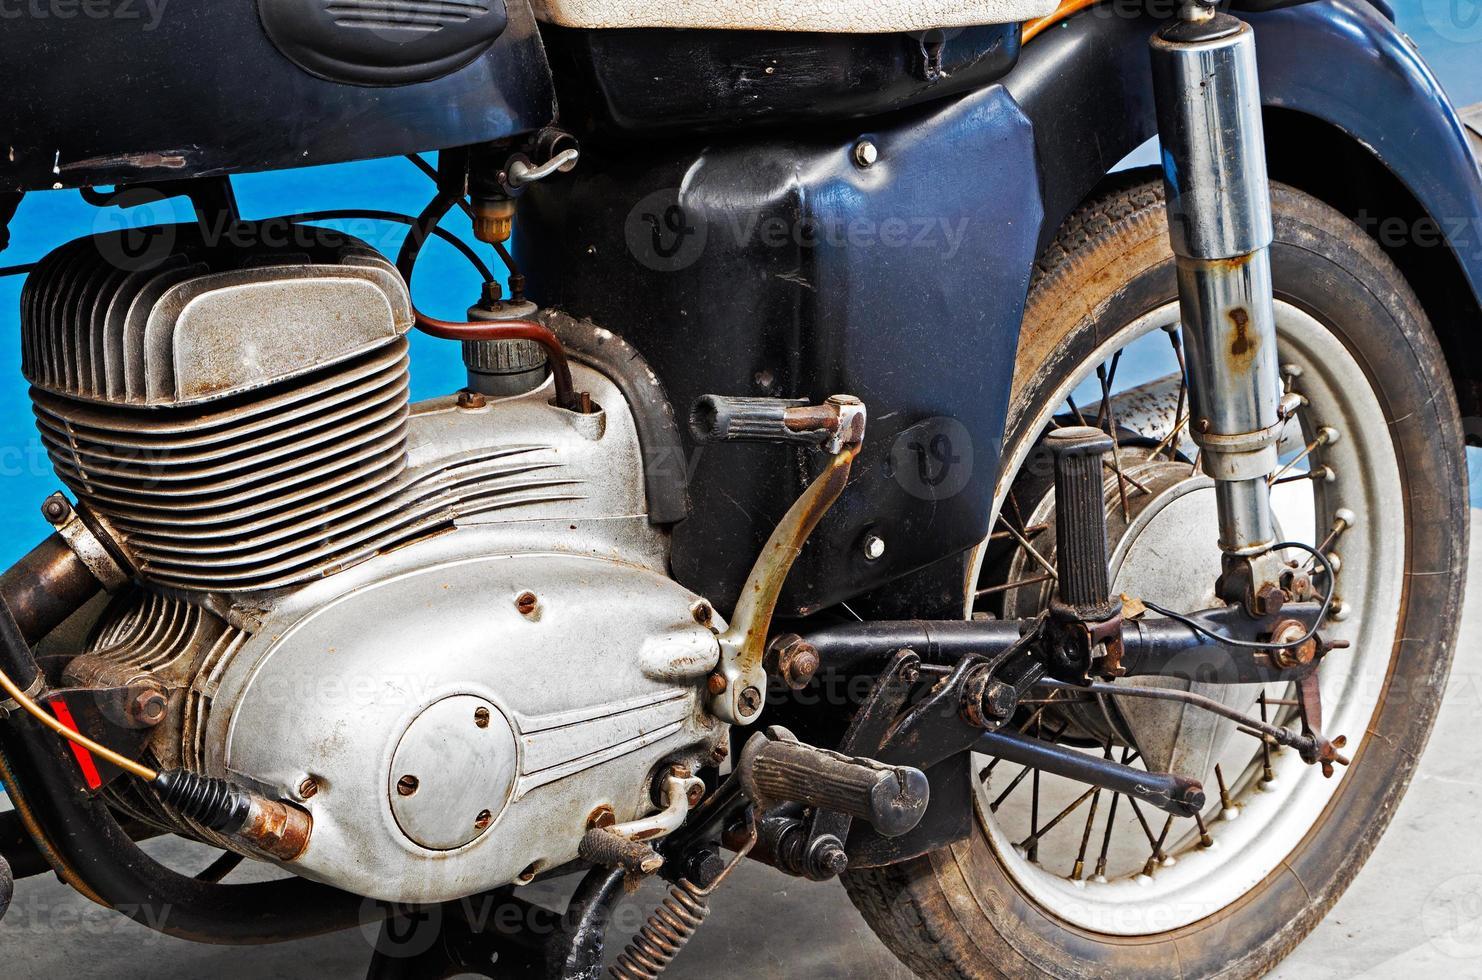 fragmento de uma moto velha enferrujada foto